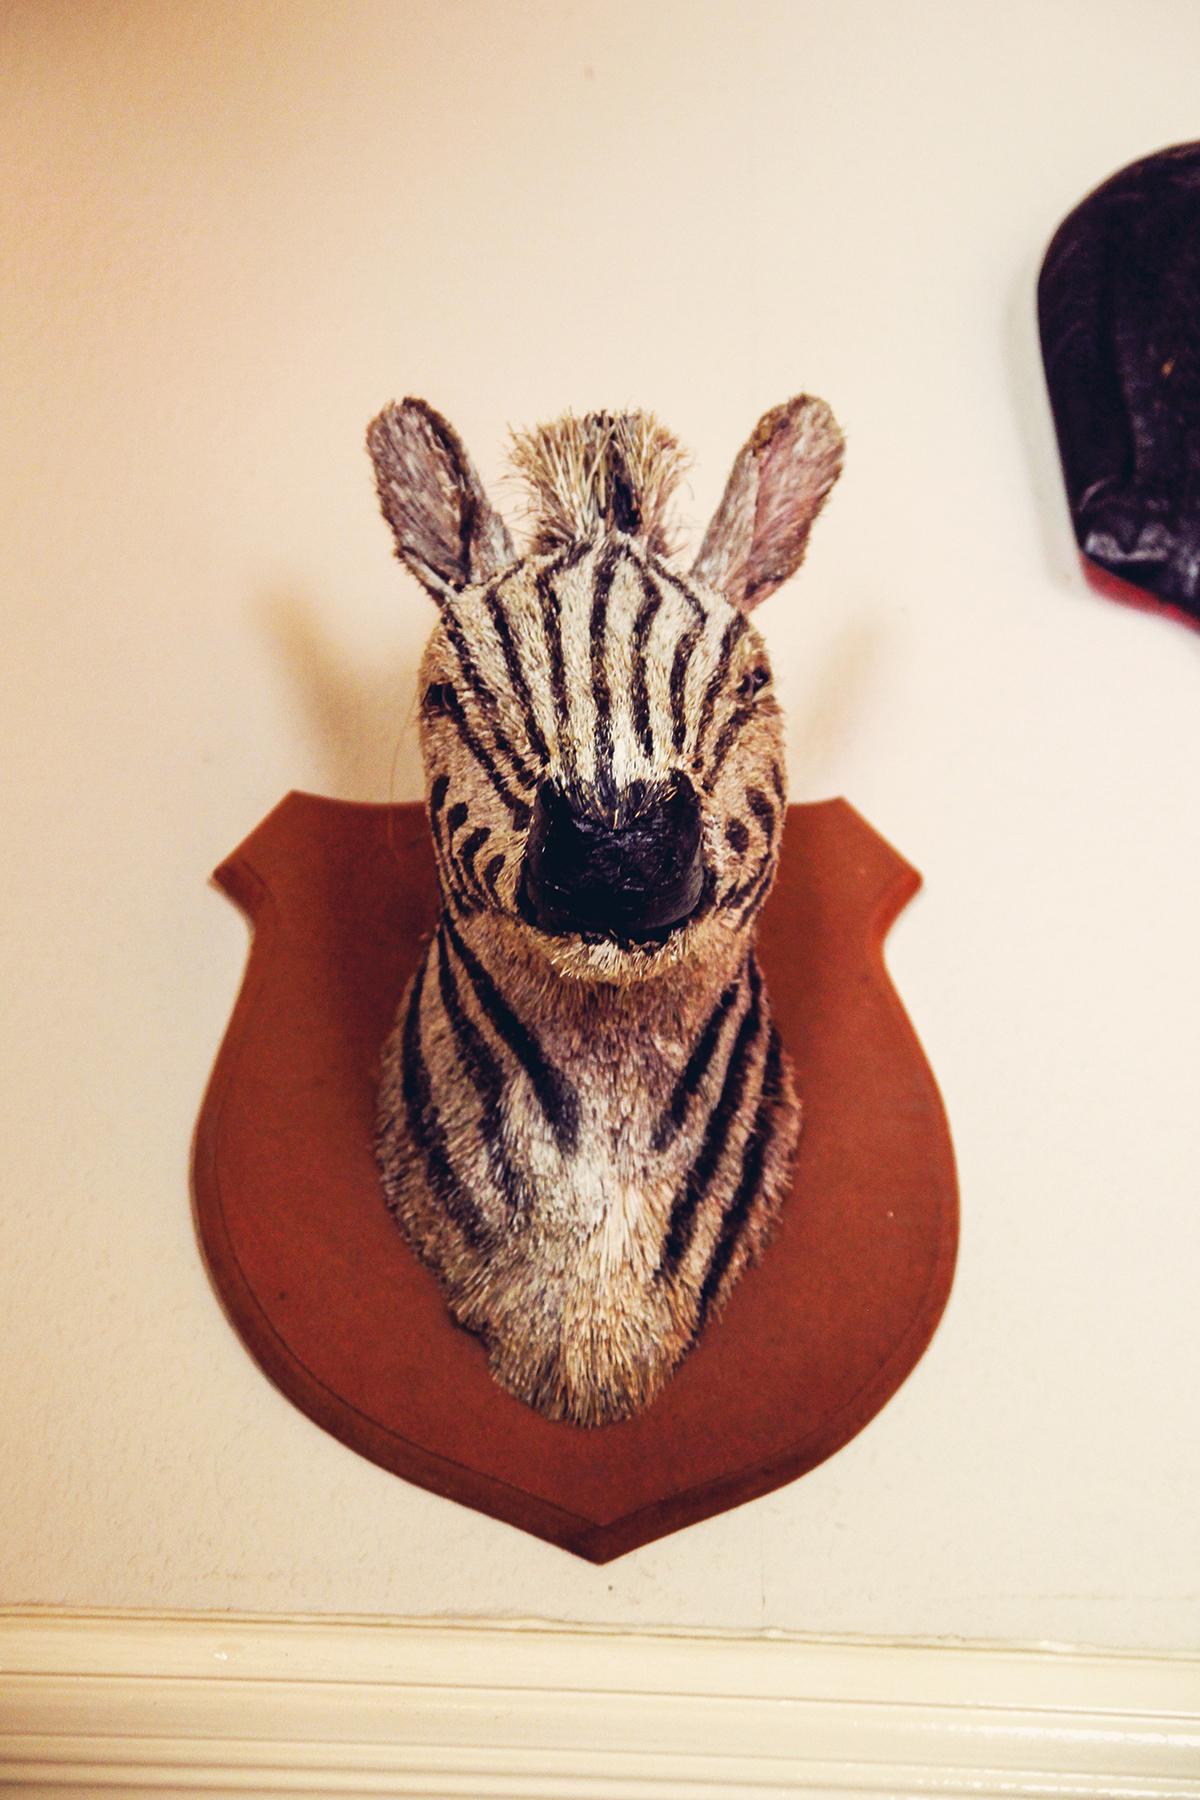 zebra-barcultura-kiel